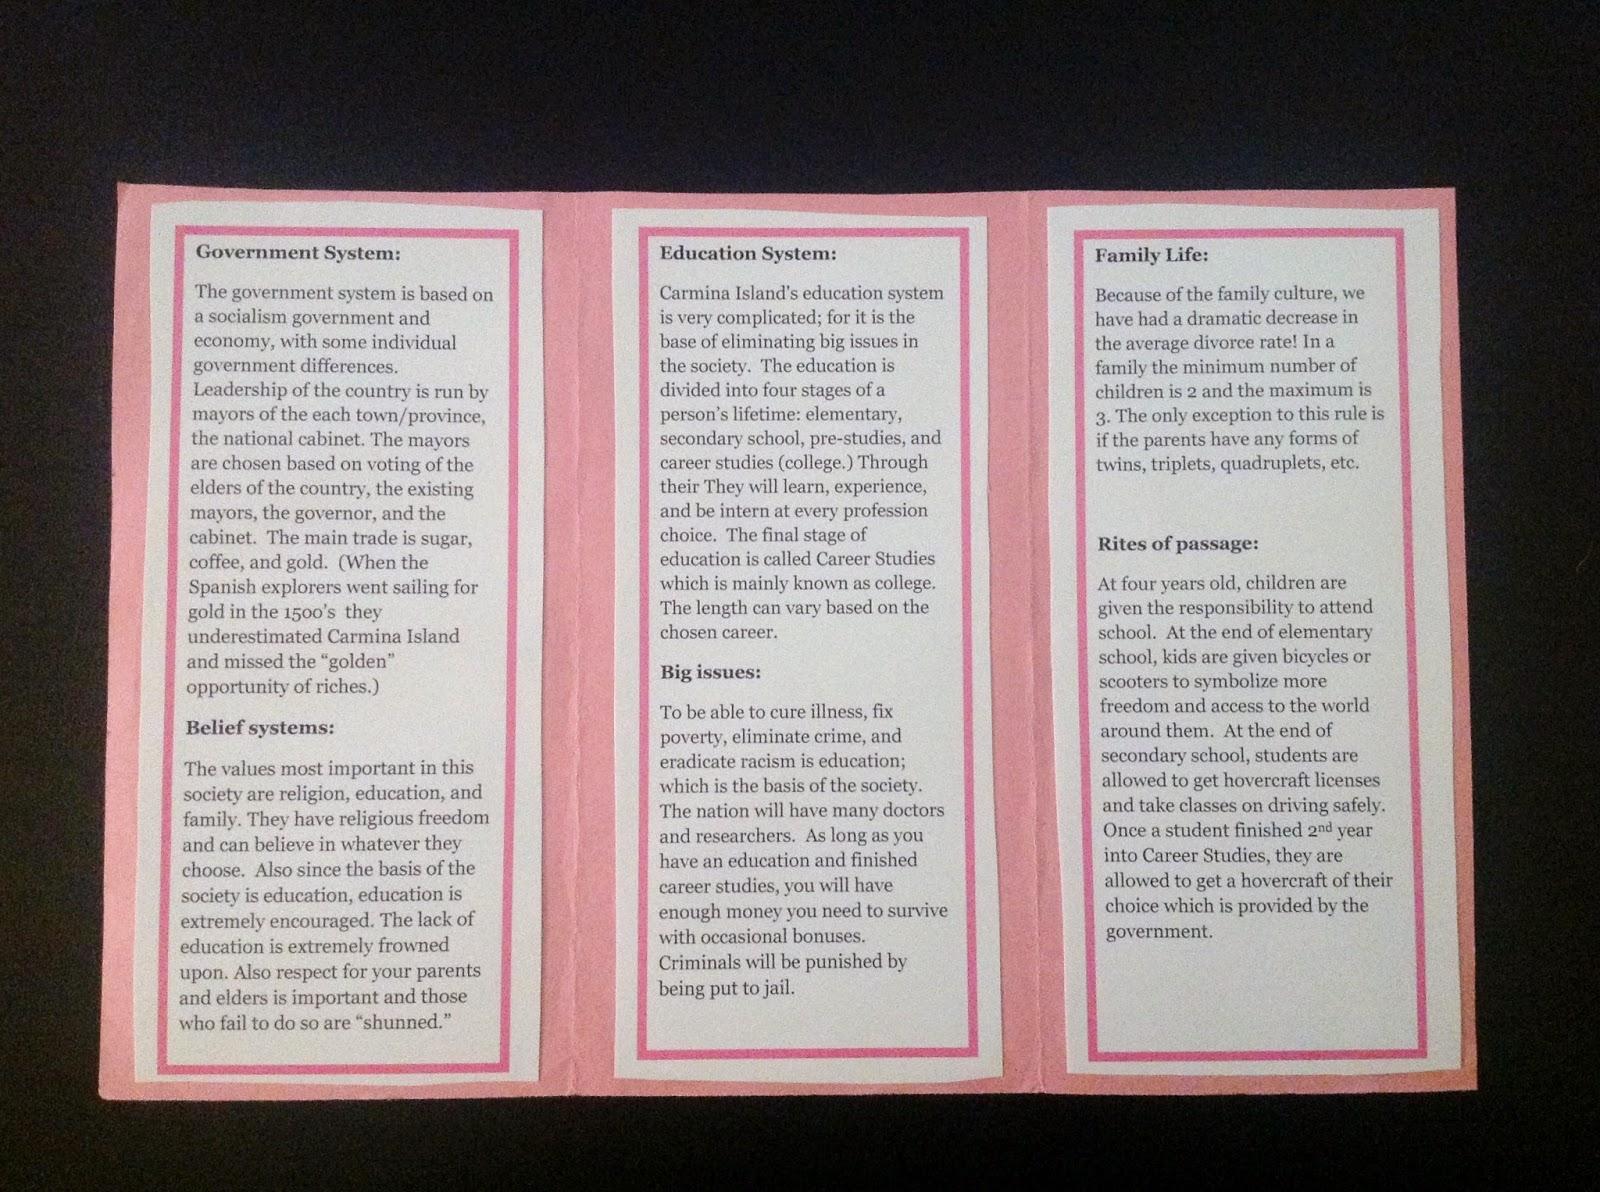 belief systems essay utopian society essay essay on character  utopian society essay essay on character traits apa short essay format examples education system essay essay on present